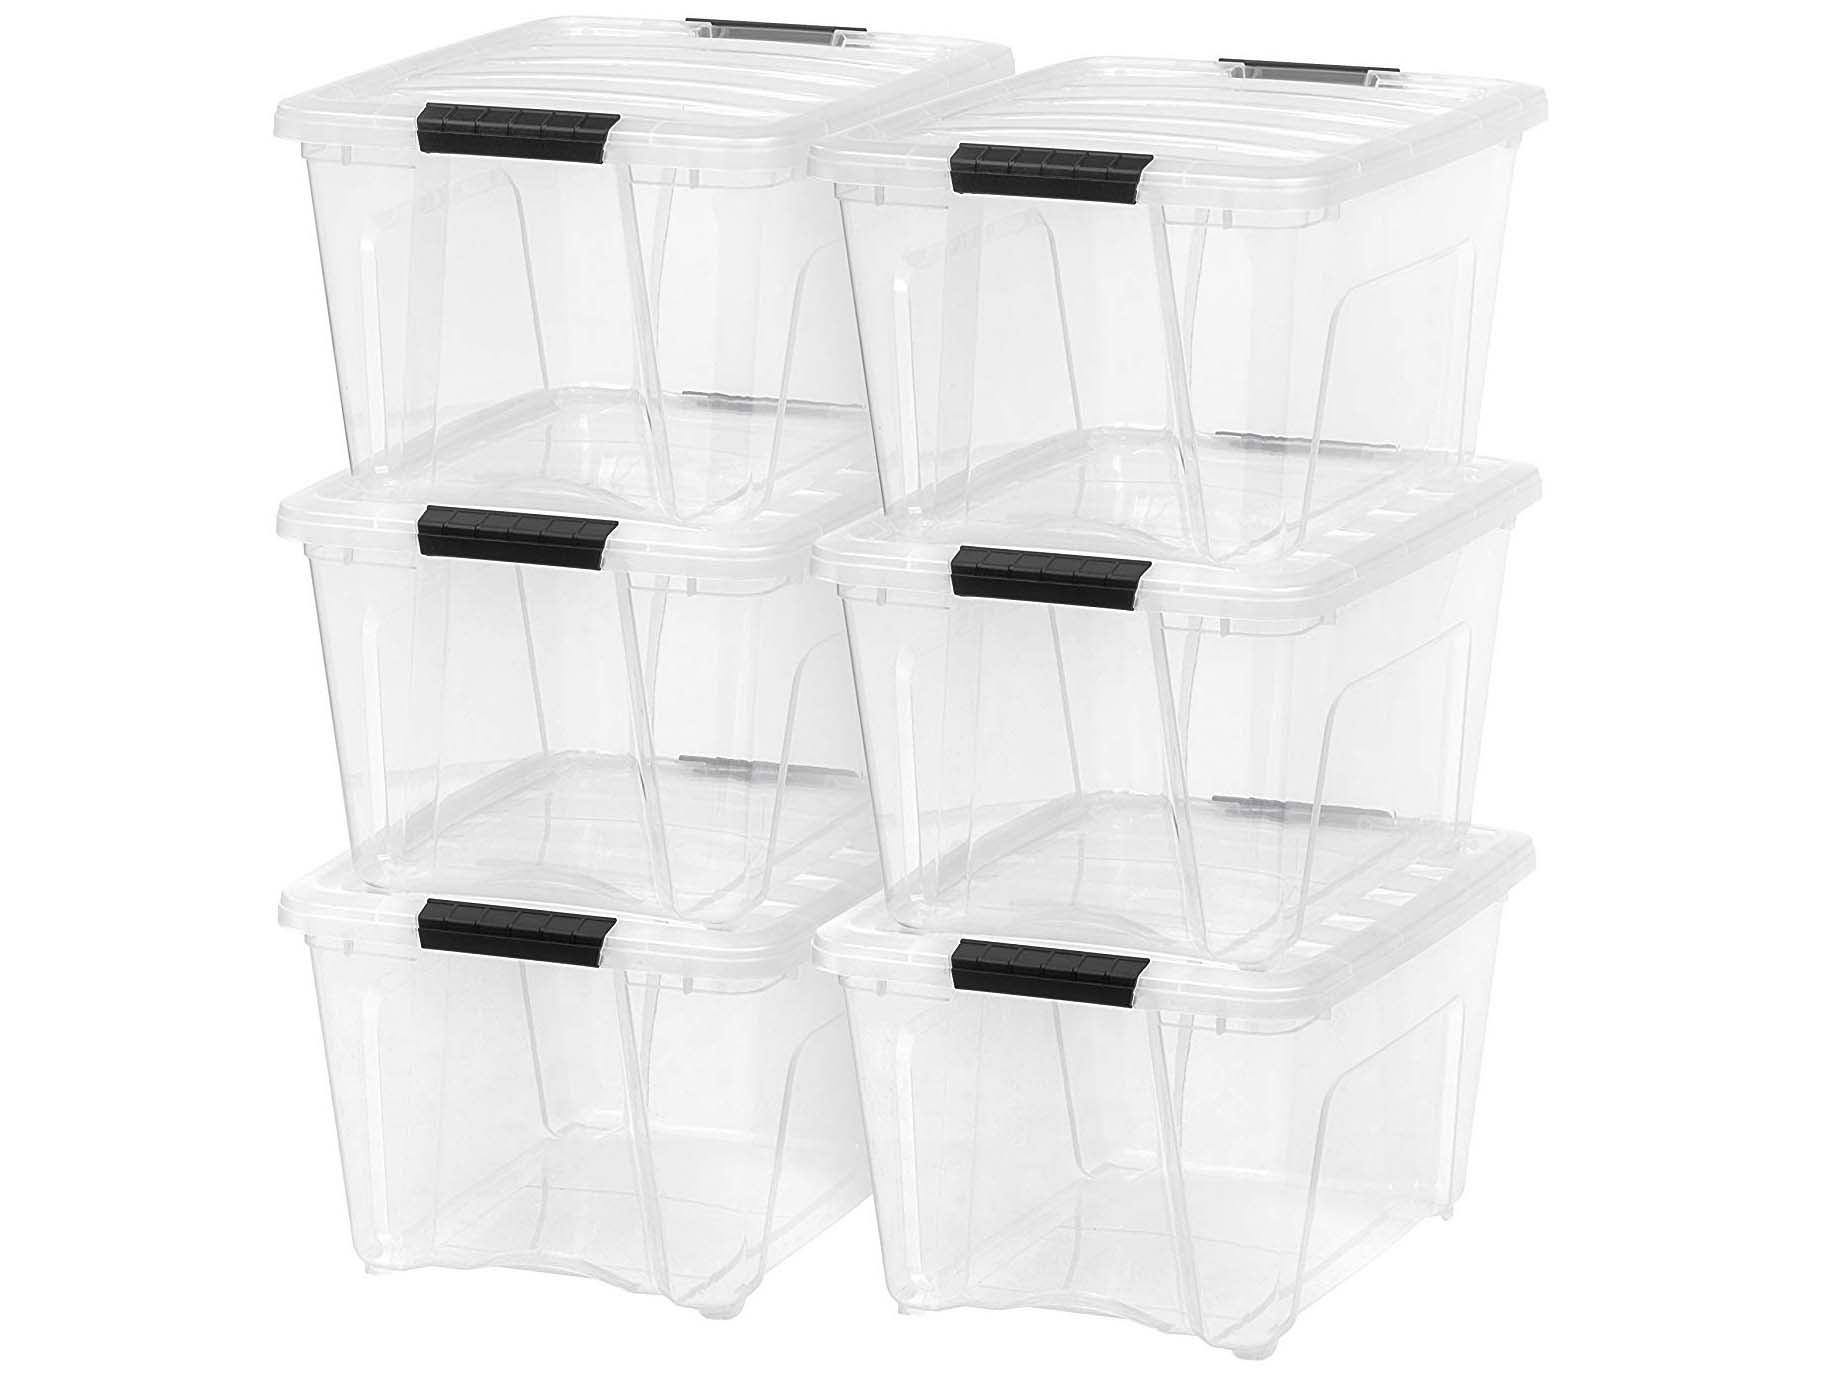 IRIS USA TB-28 32 Quart Stack & Pull Box, Clear, 6 Count